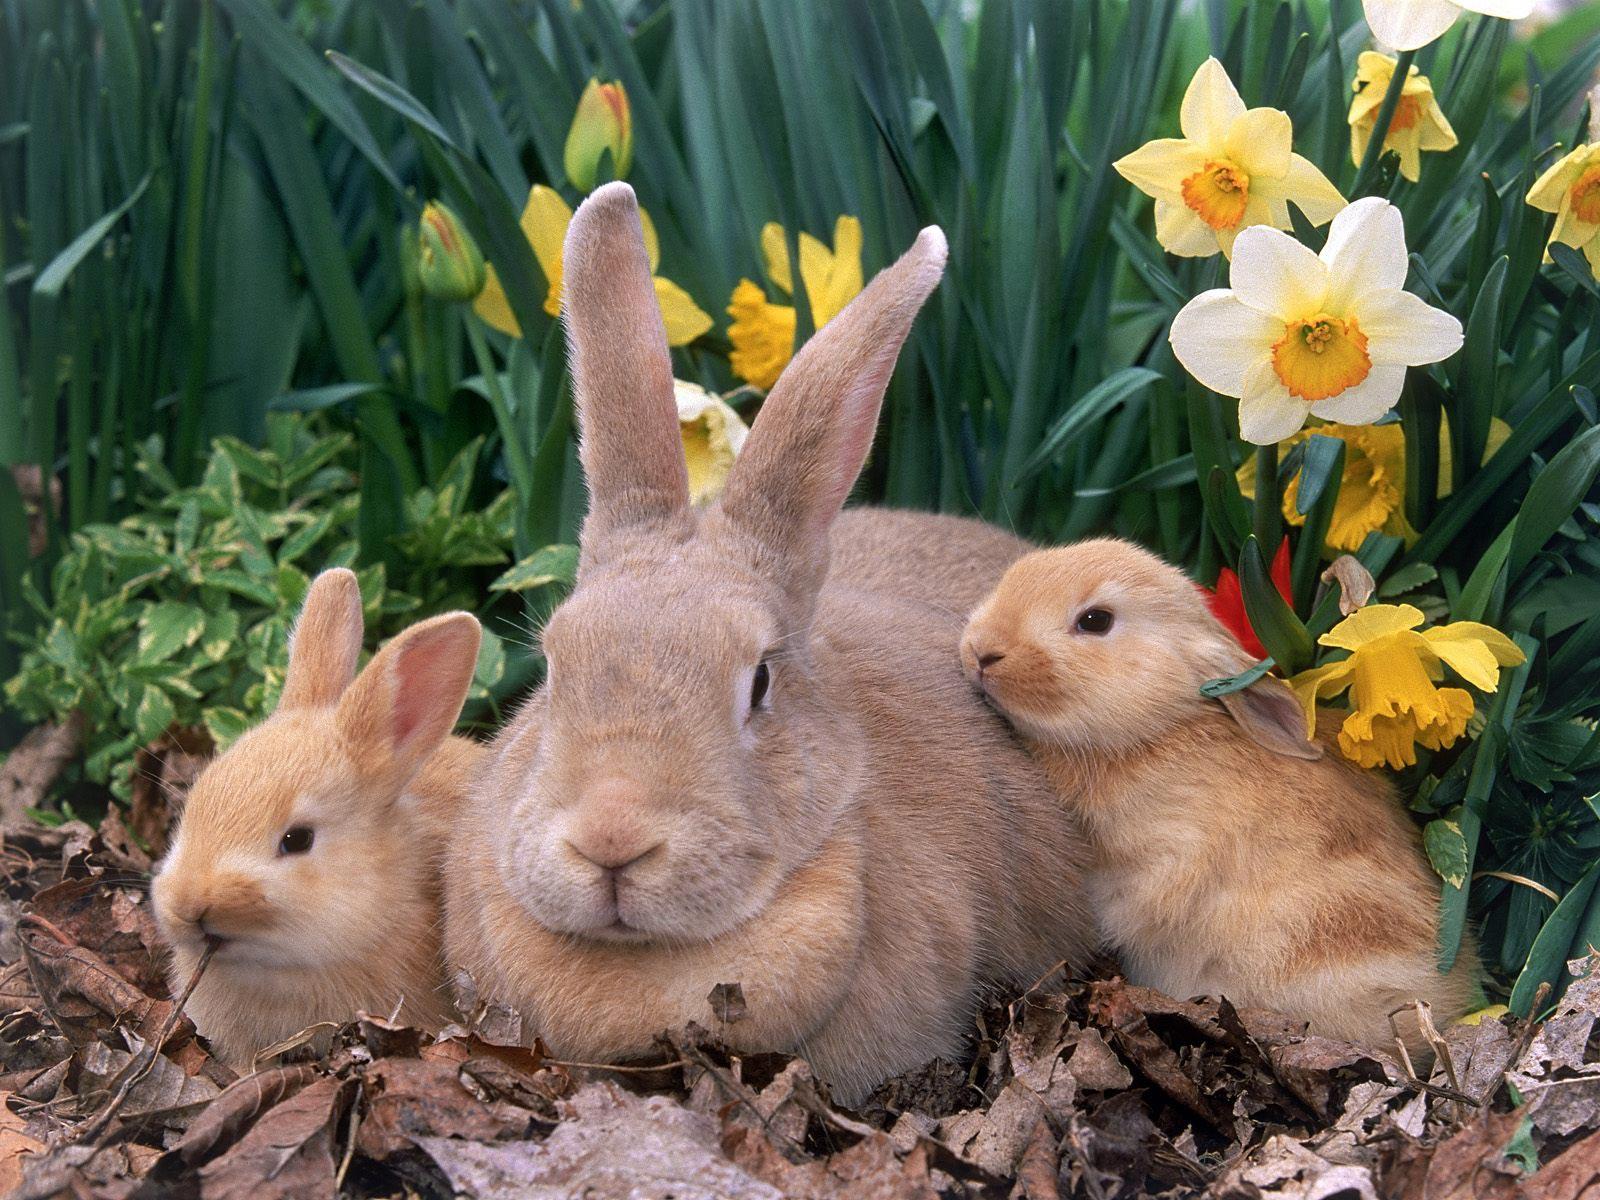 6 cute bunny rabbit easter wallpapers for desktop free - Easter bunny wallpaper ...